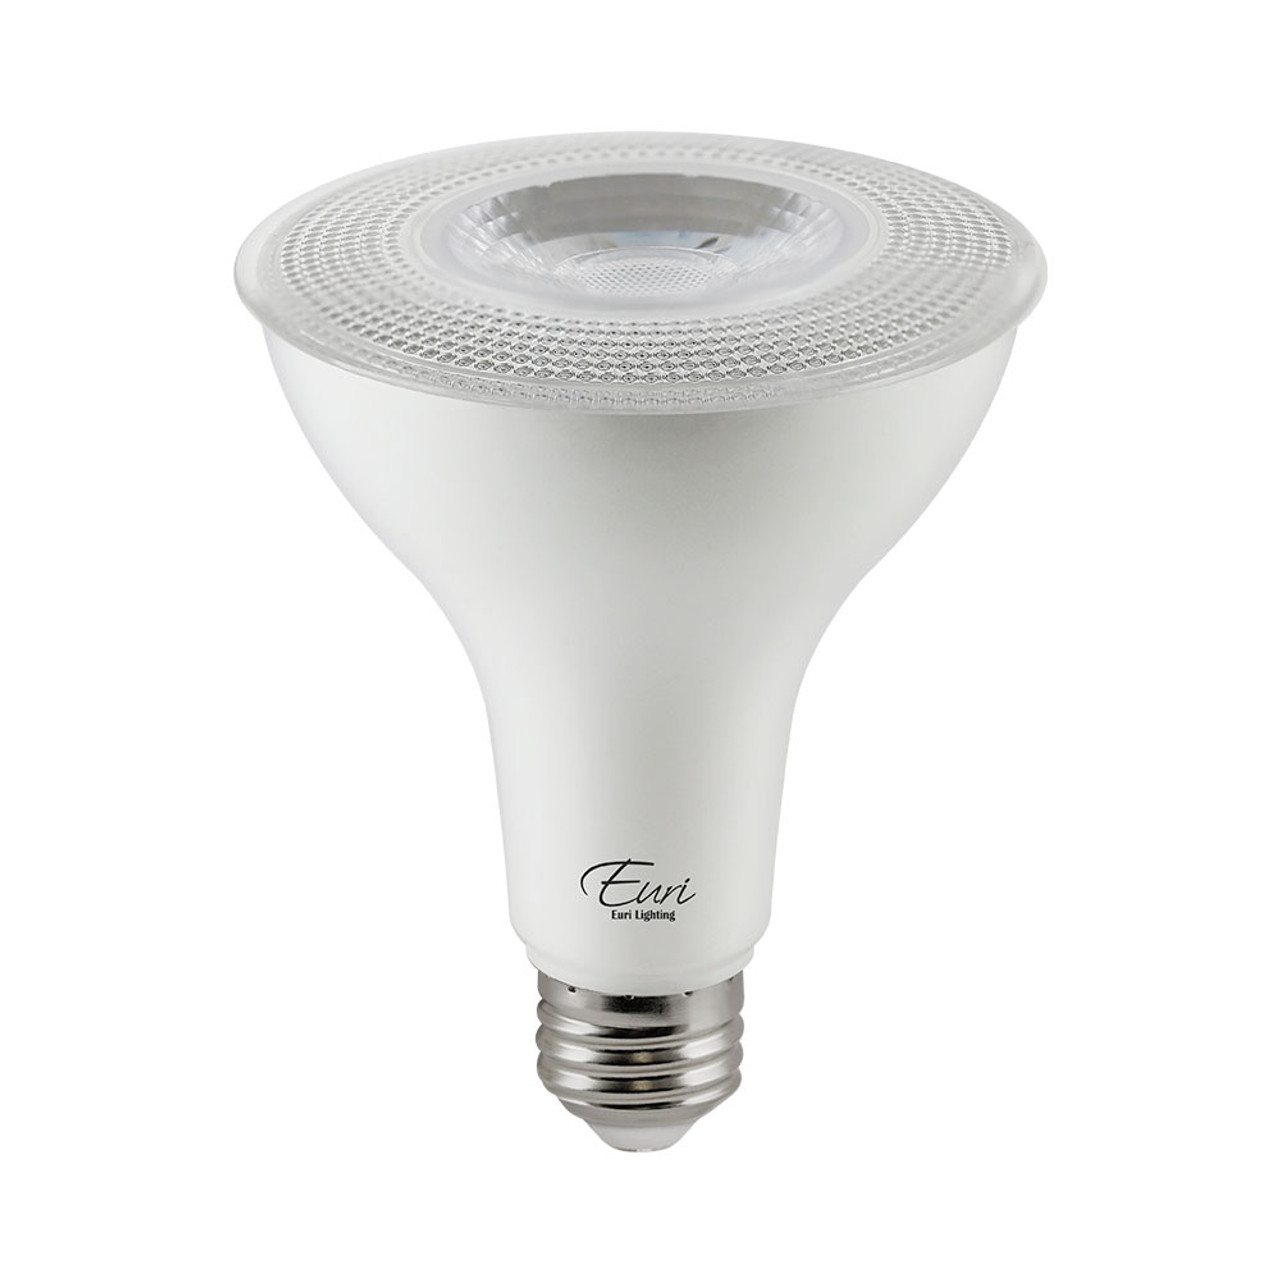 PAR30 (Long Neck), Directional (Wide Spot), LED Light Bulb, Dimmable, 11 W, 120 V, 850 lm, 3000K, Halogen Look, E26 Base (EP30-11W6000e)